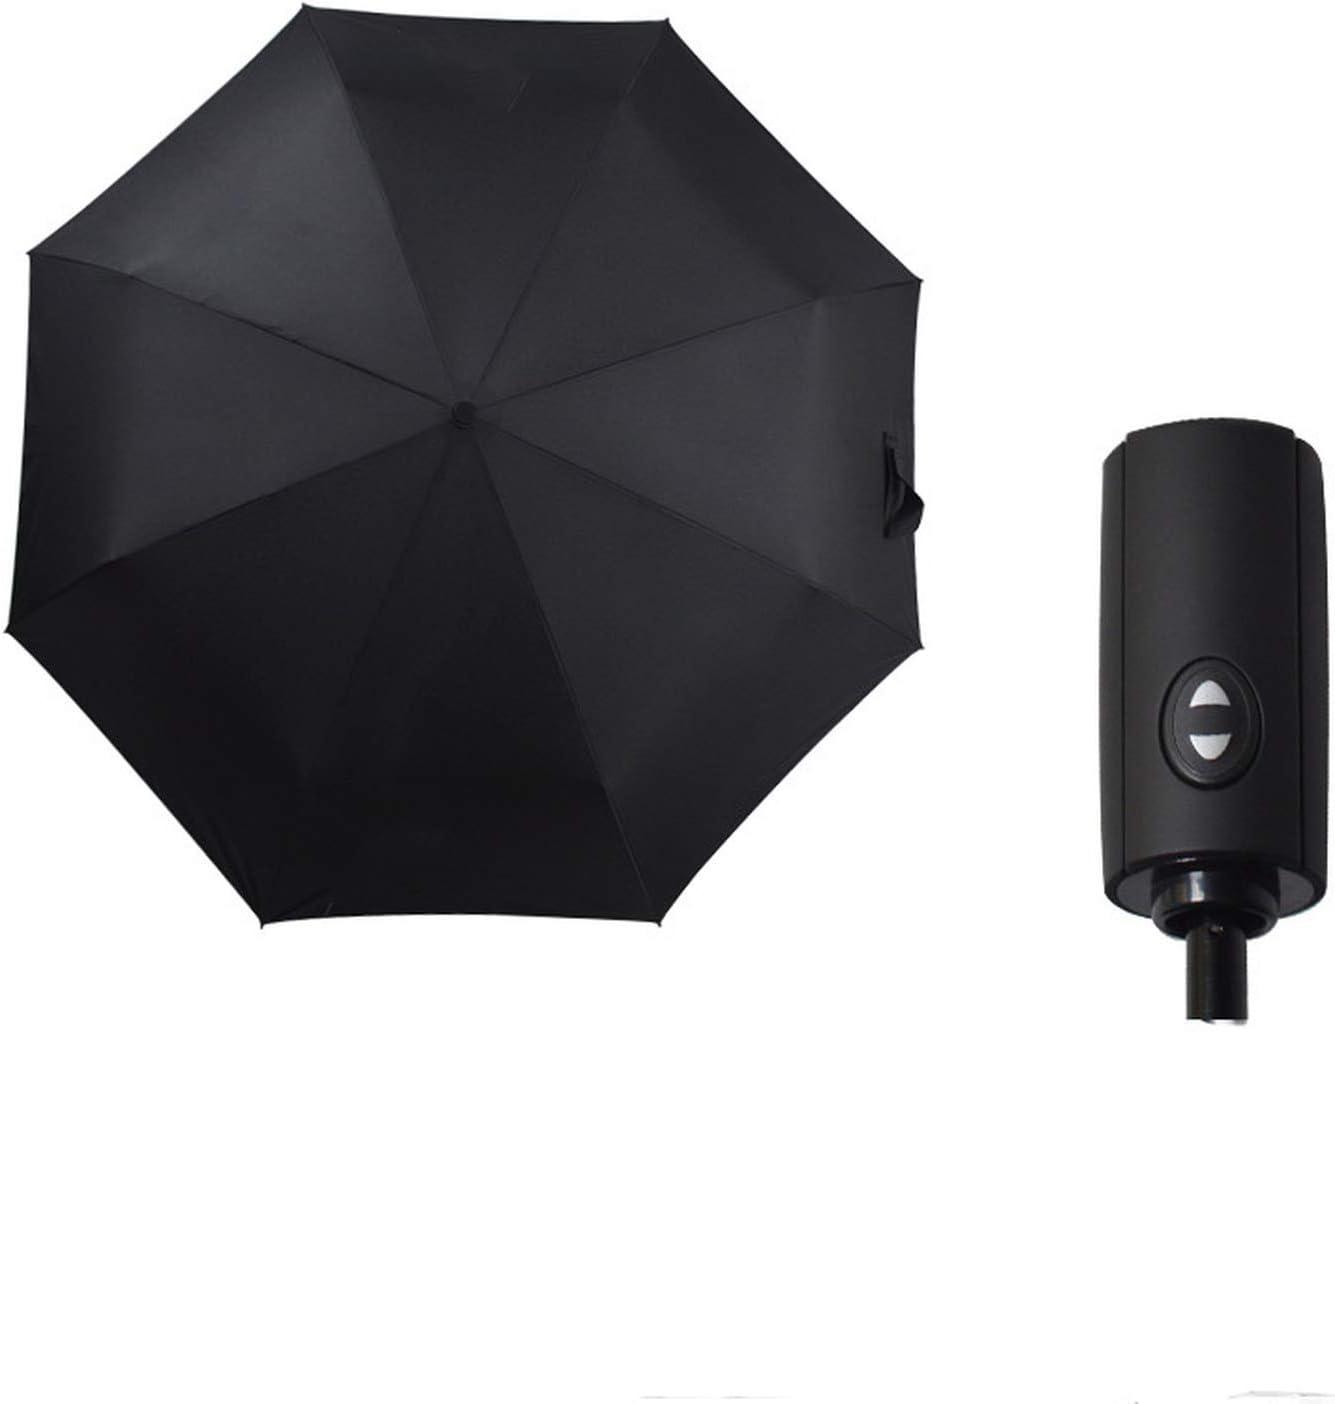 32cm long when closed Totes Black Folding Umbrella